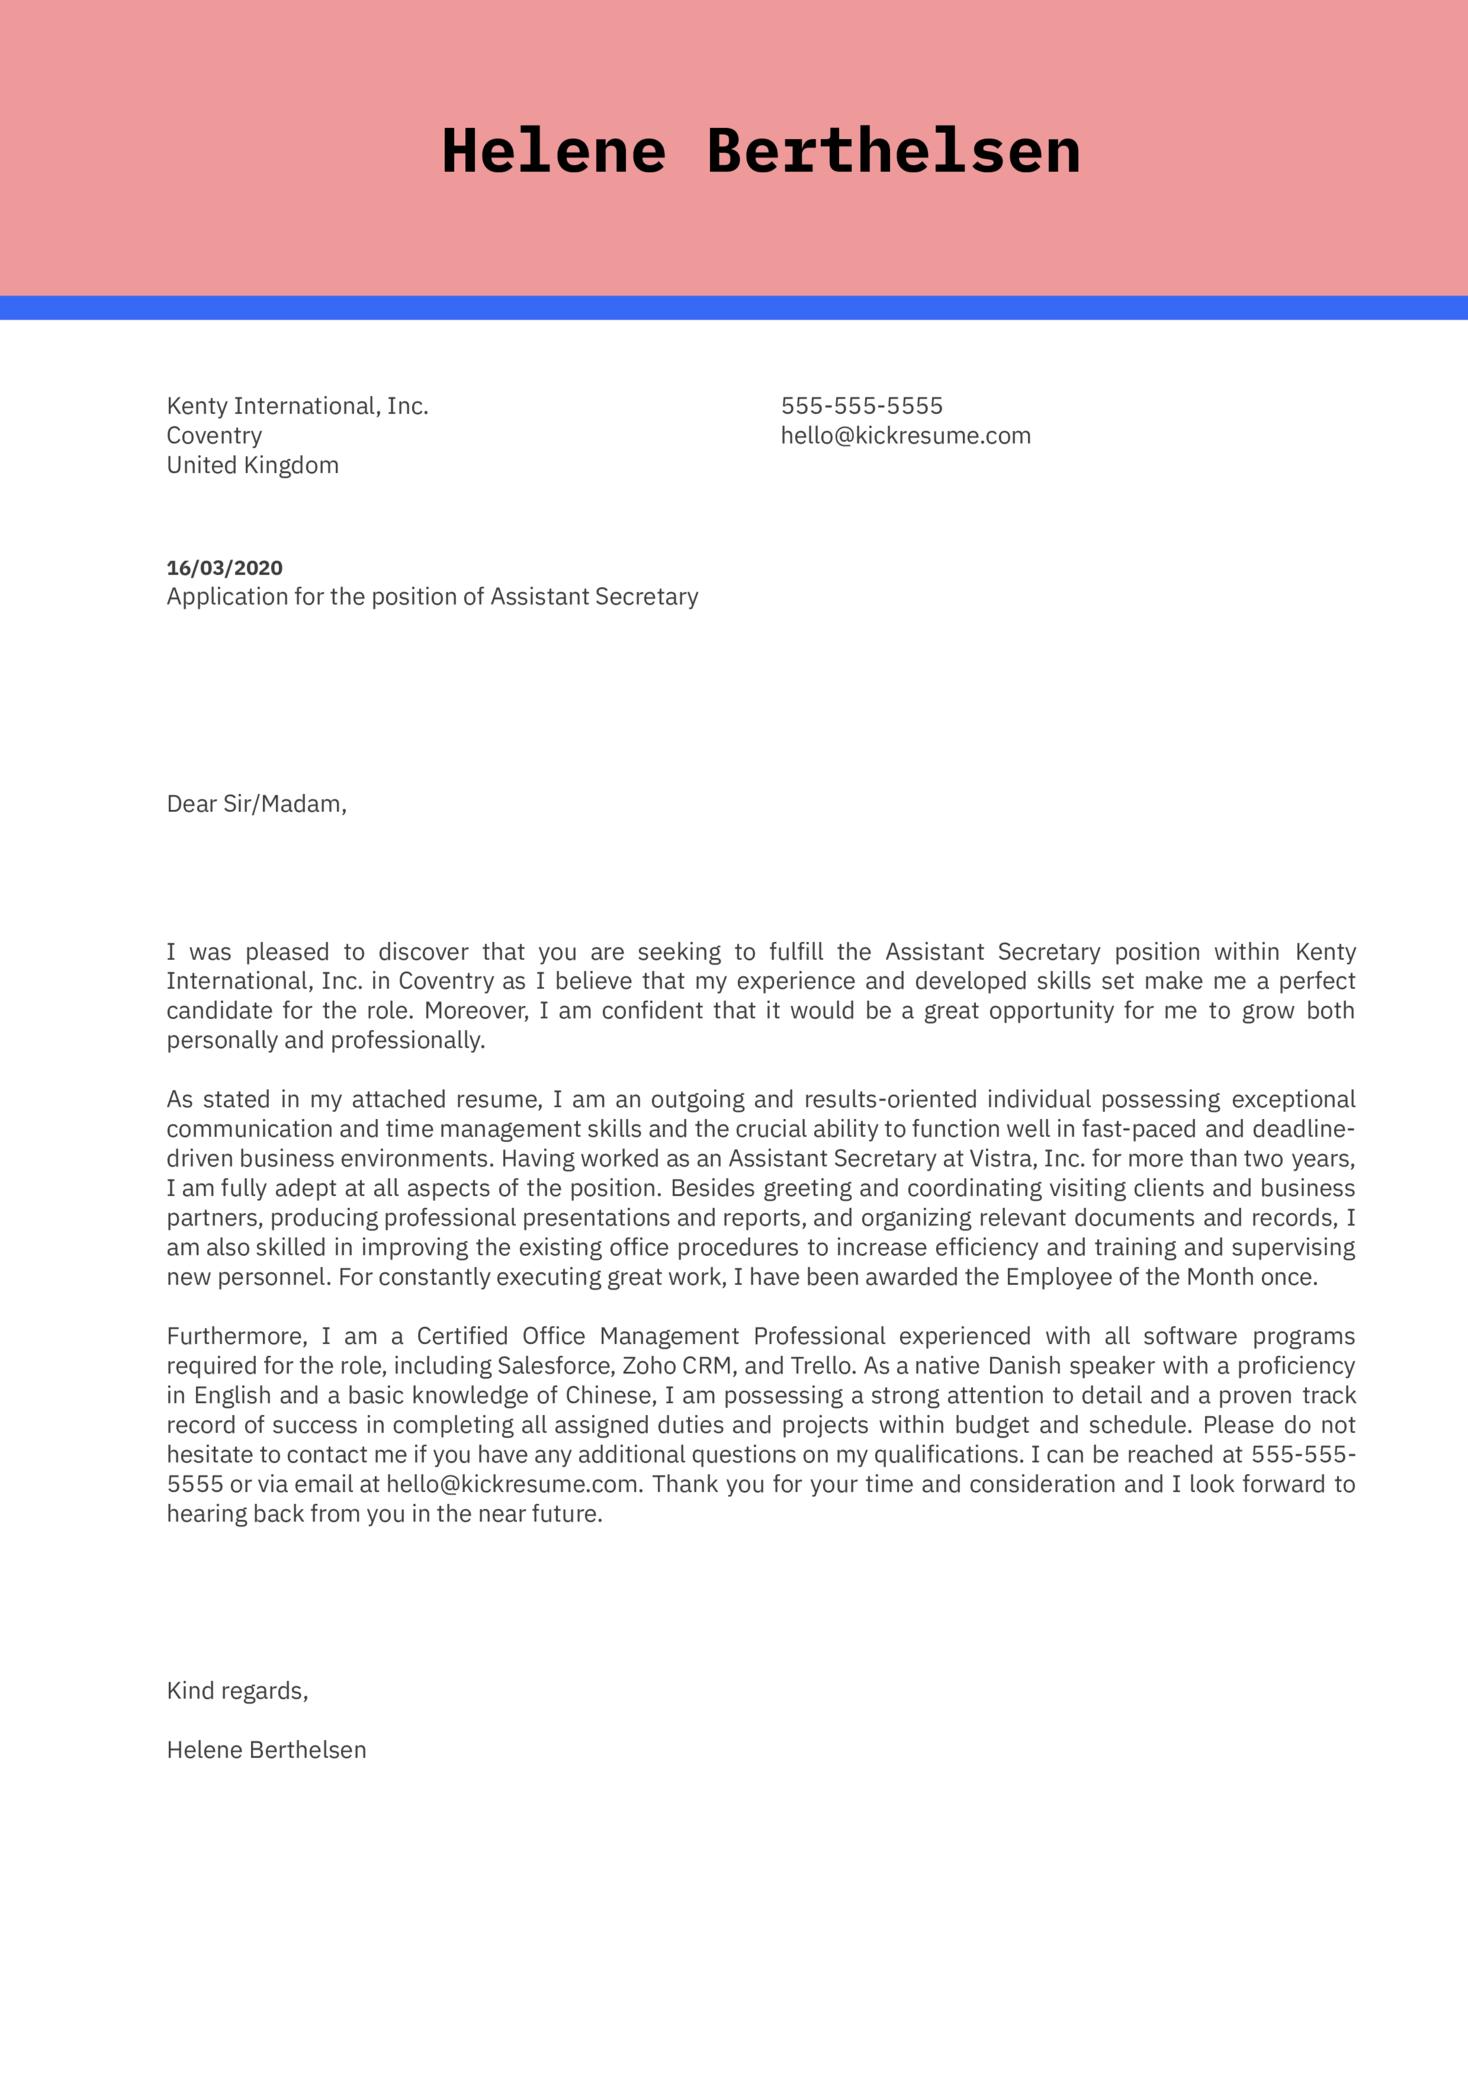 Assistant Secretary Cover Letter Sample